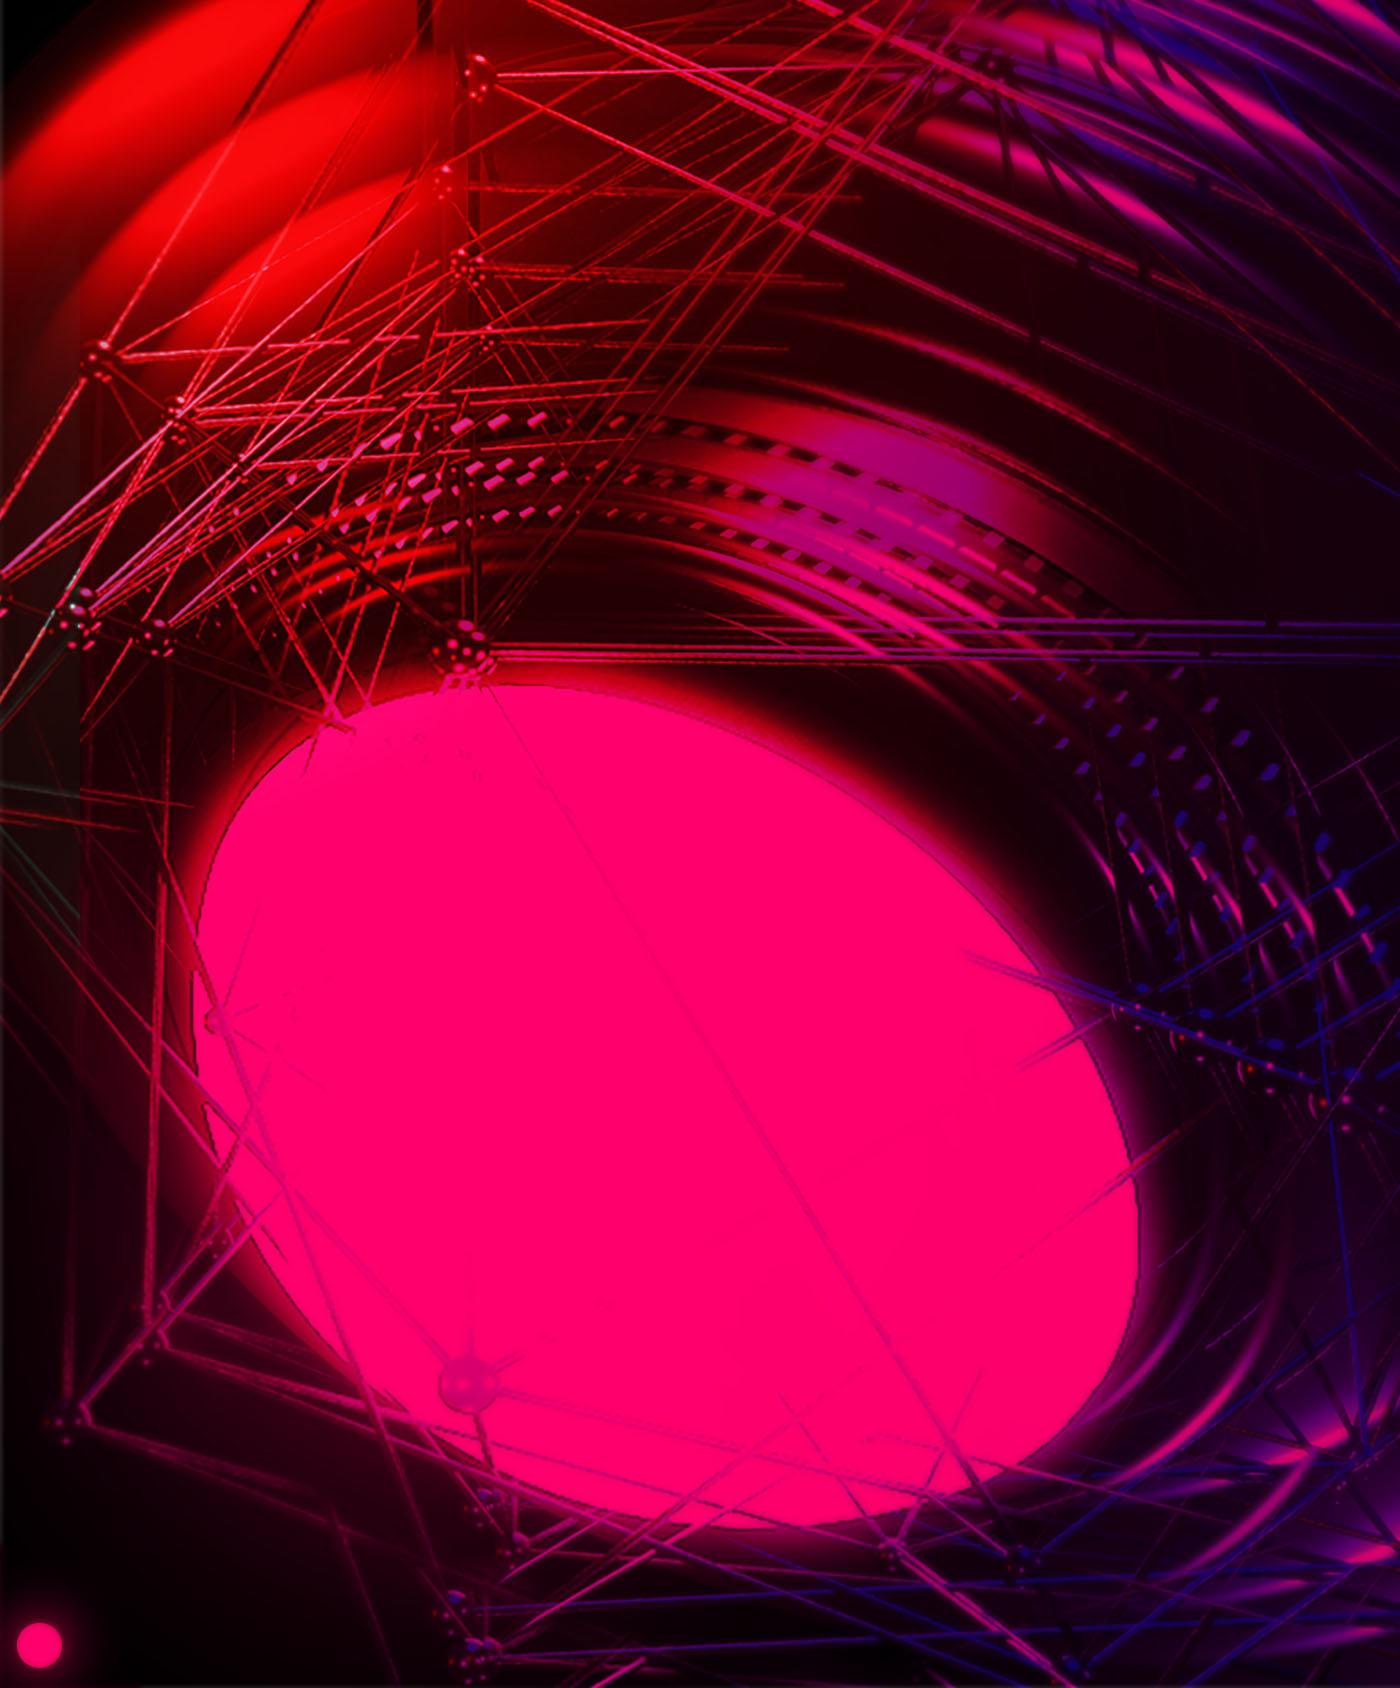 lensplexus_trap 0001.jpg